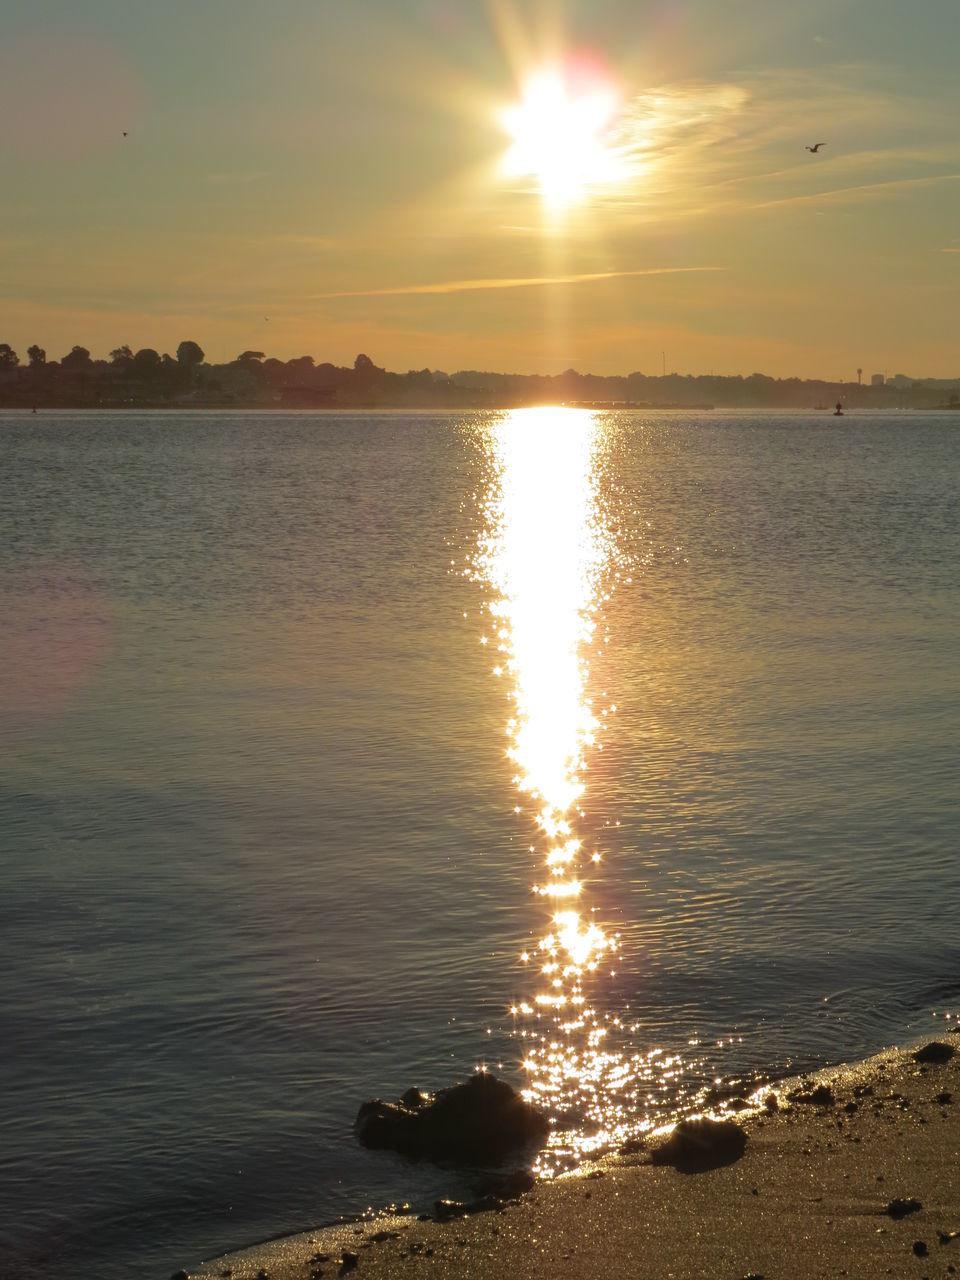 sunset, sun, beauty in nature, nature, scenics, water, sunlight, orange color, tranquility, reflection, tranquil scene, sea, sunbeam, silhouette, sky, no people, idyllic, outdoors, beach, tree